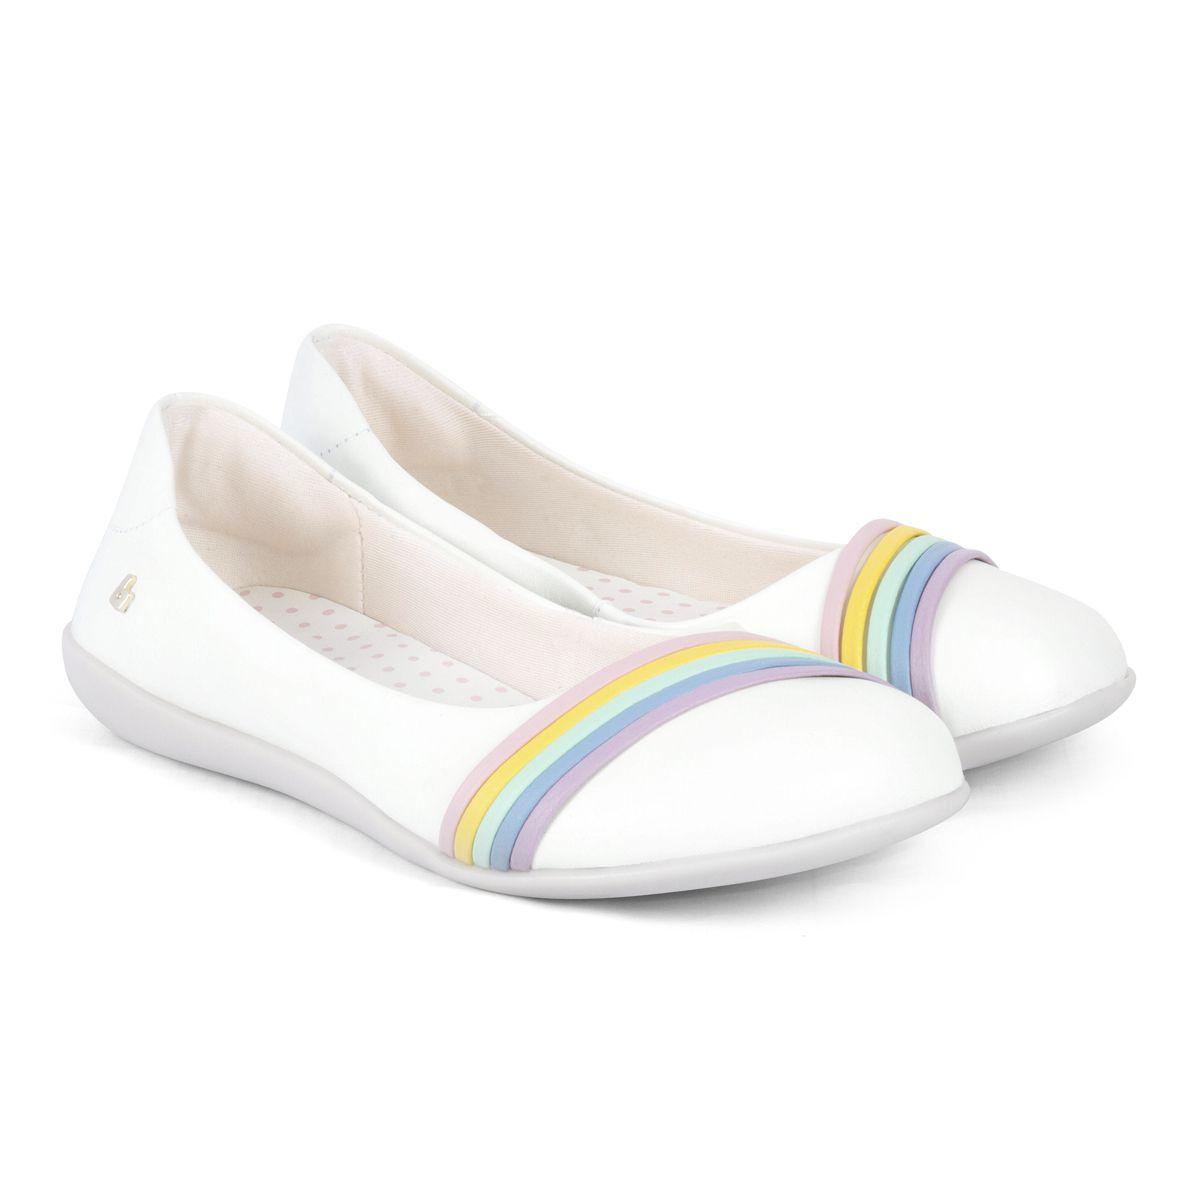 Sapatilha Infantil BIBI Rainbow Feminina Branco Colorido